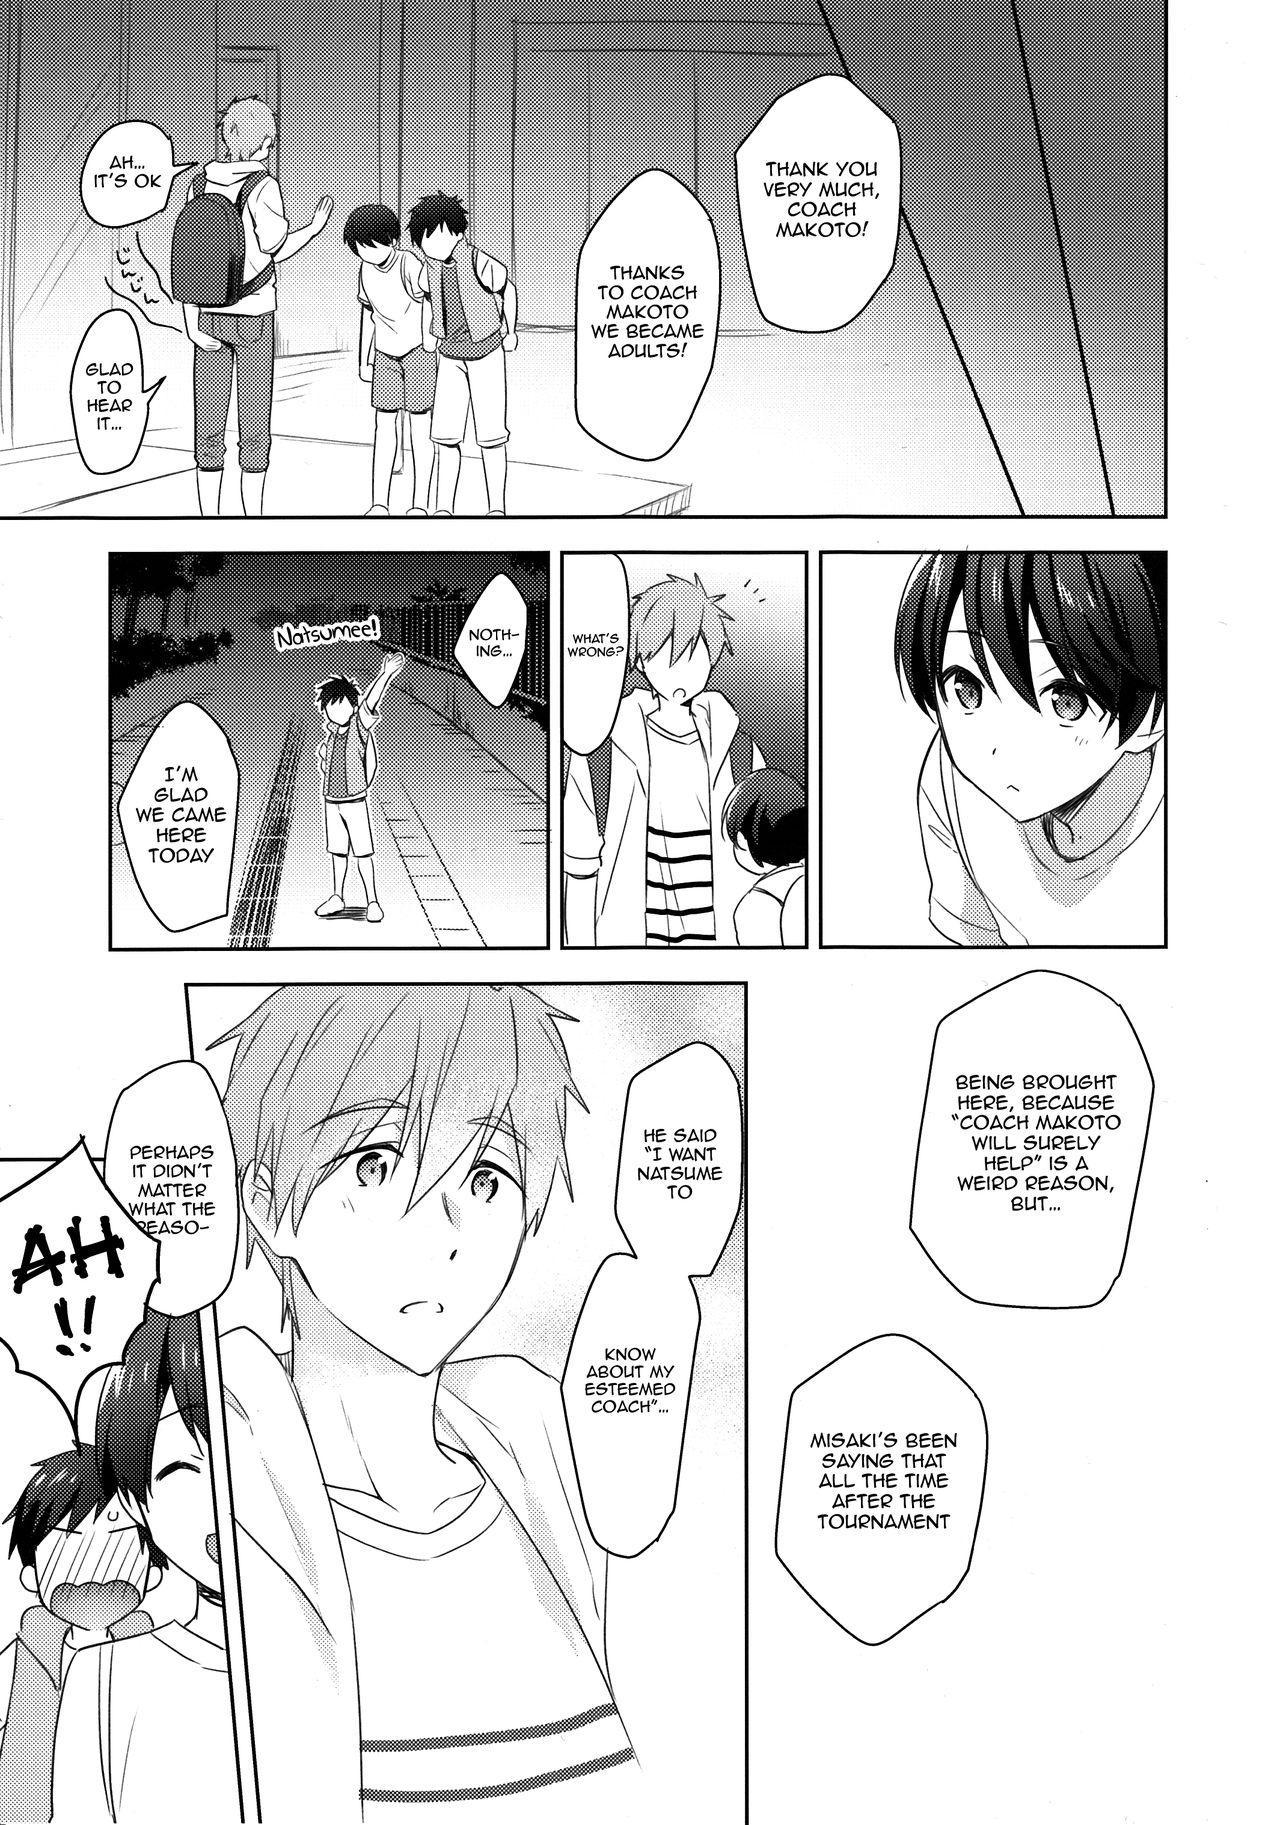 Makoto Coach ni Onegai! | Please, Coach Makoto! 21